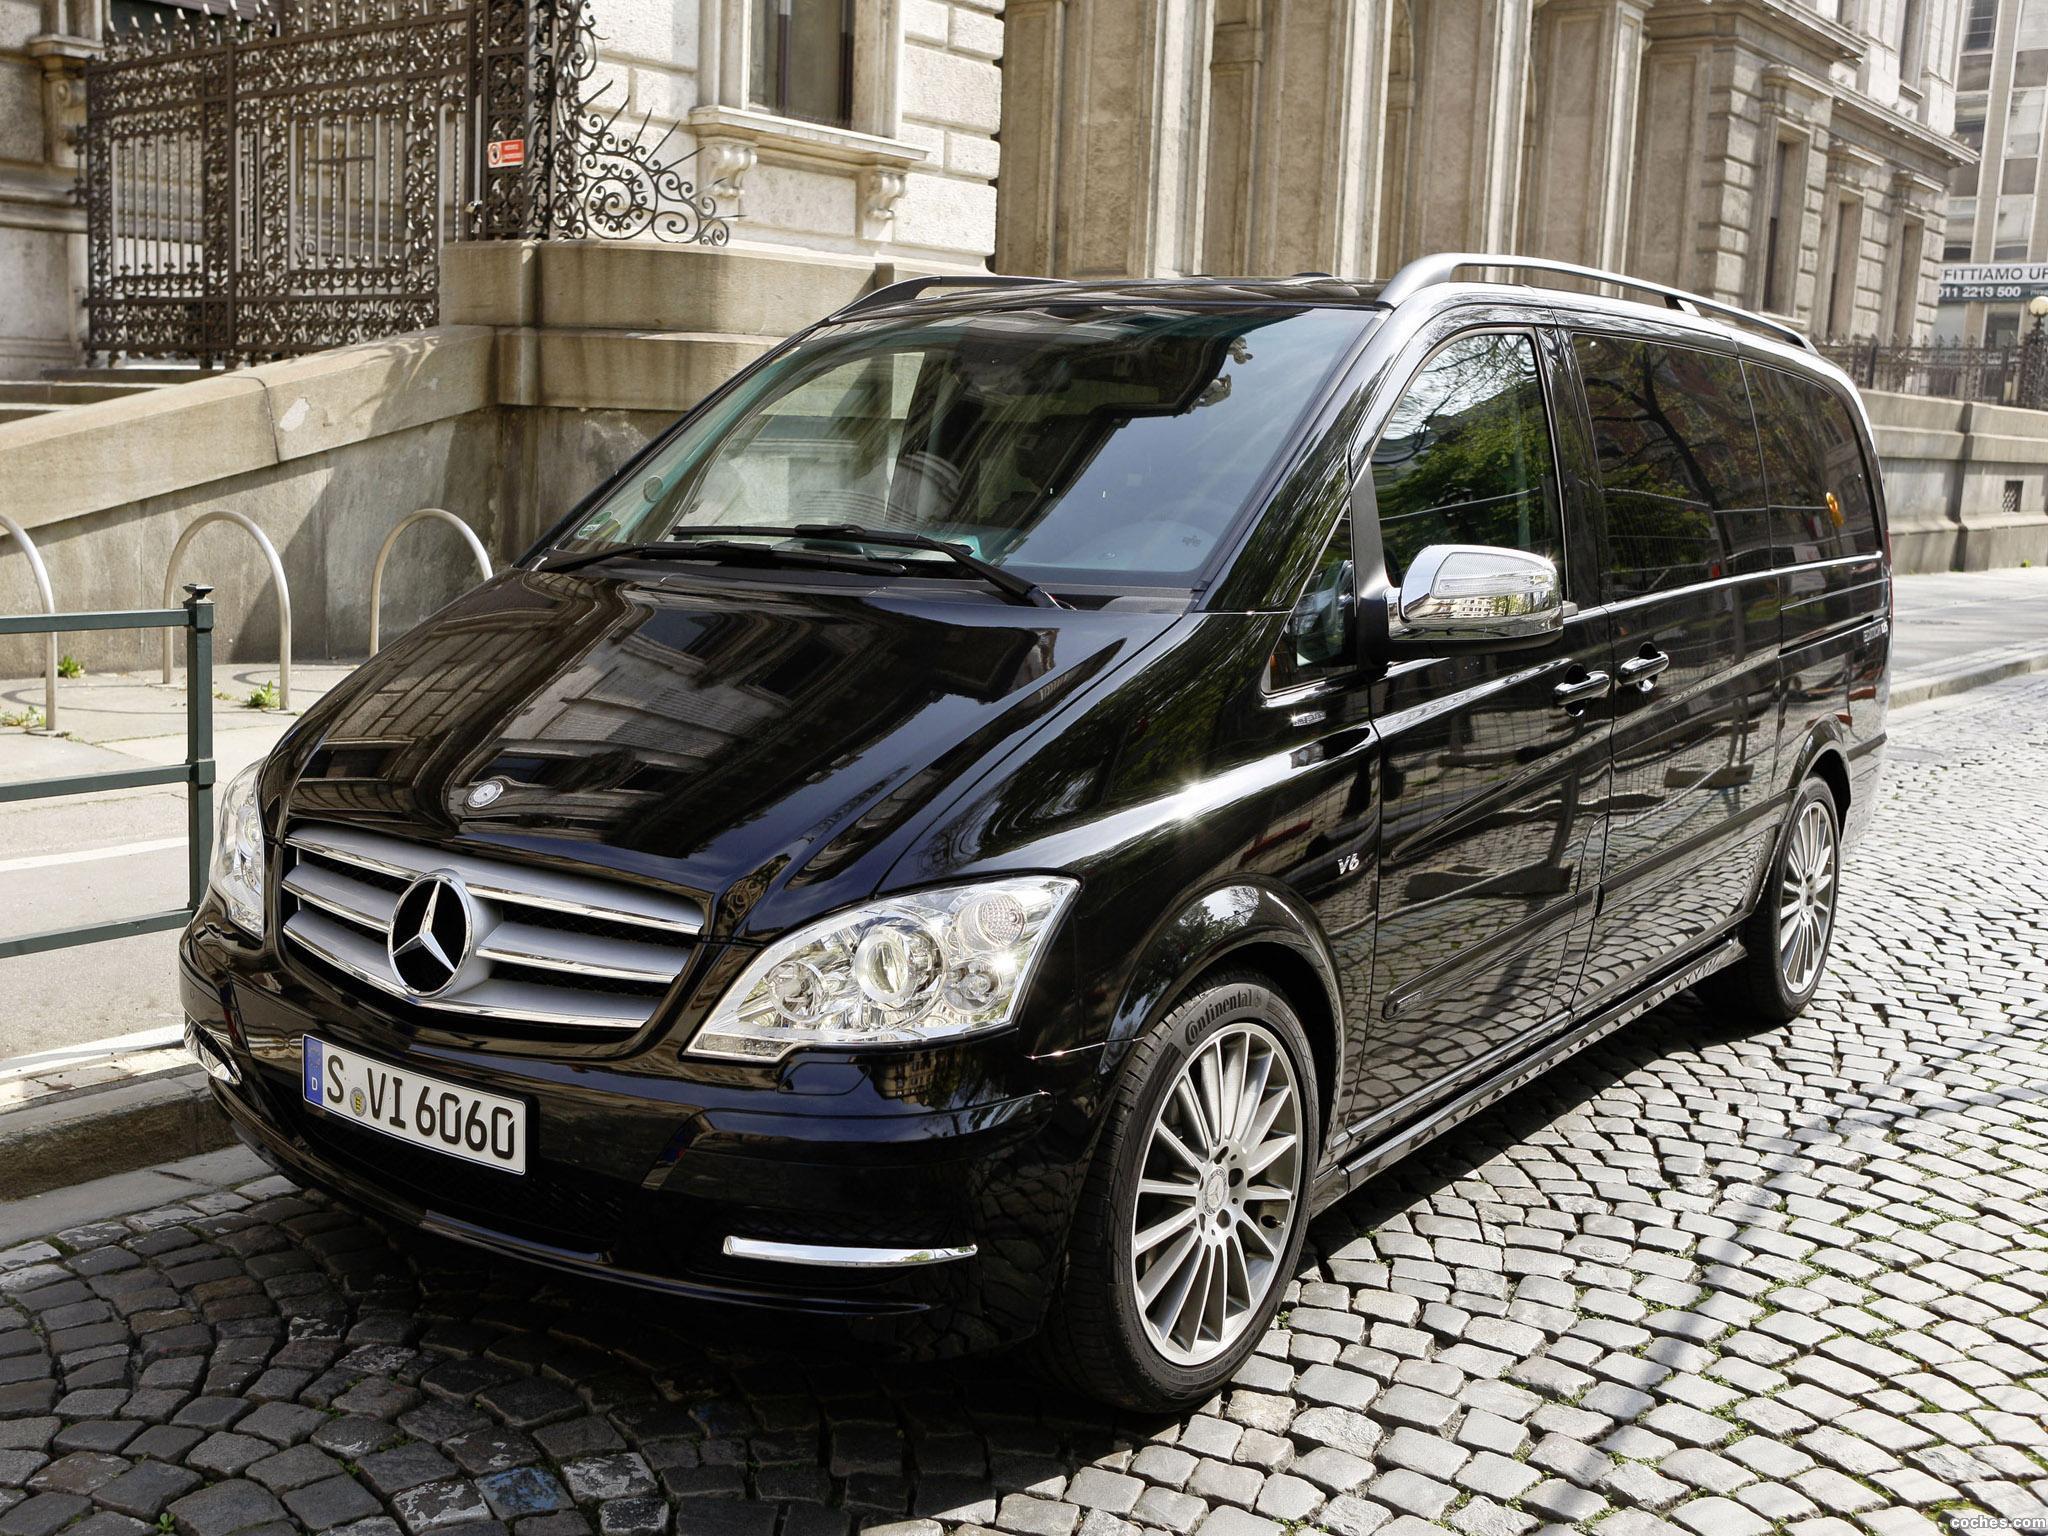 Foto 0 de Mercedes Viano Carisma Auto Design 2013